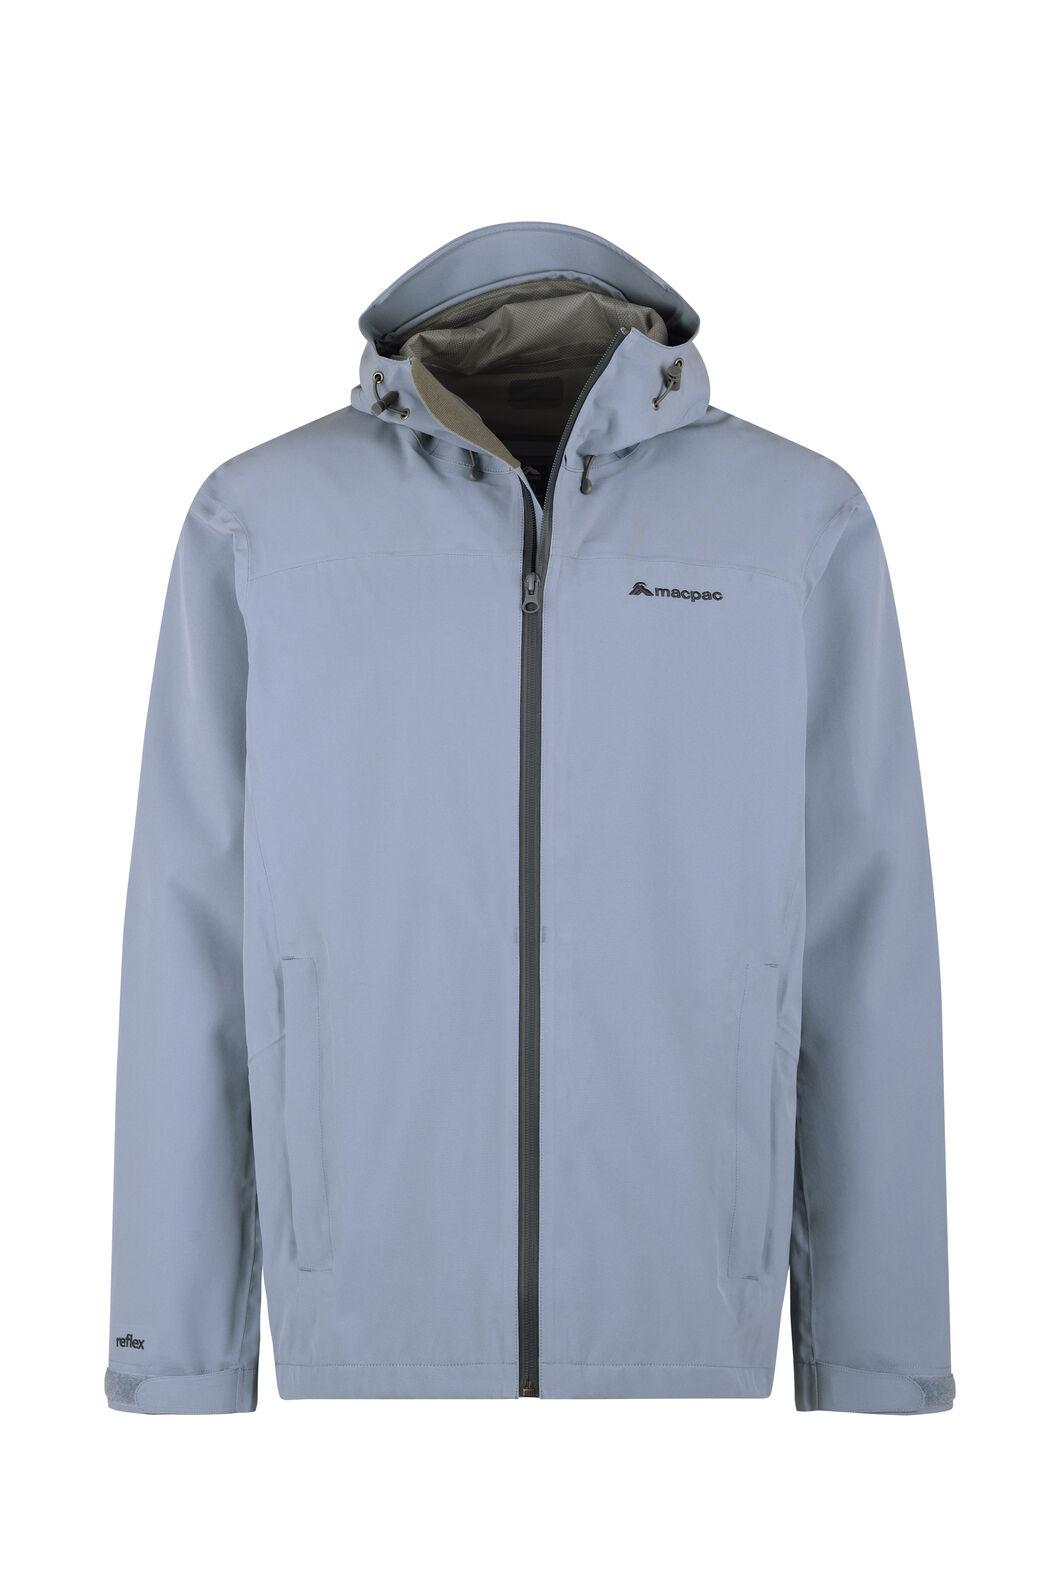 Macpac Dispatch Rain Jacket - Men's, Flint Stone, hi-res